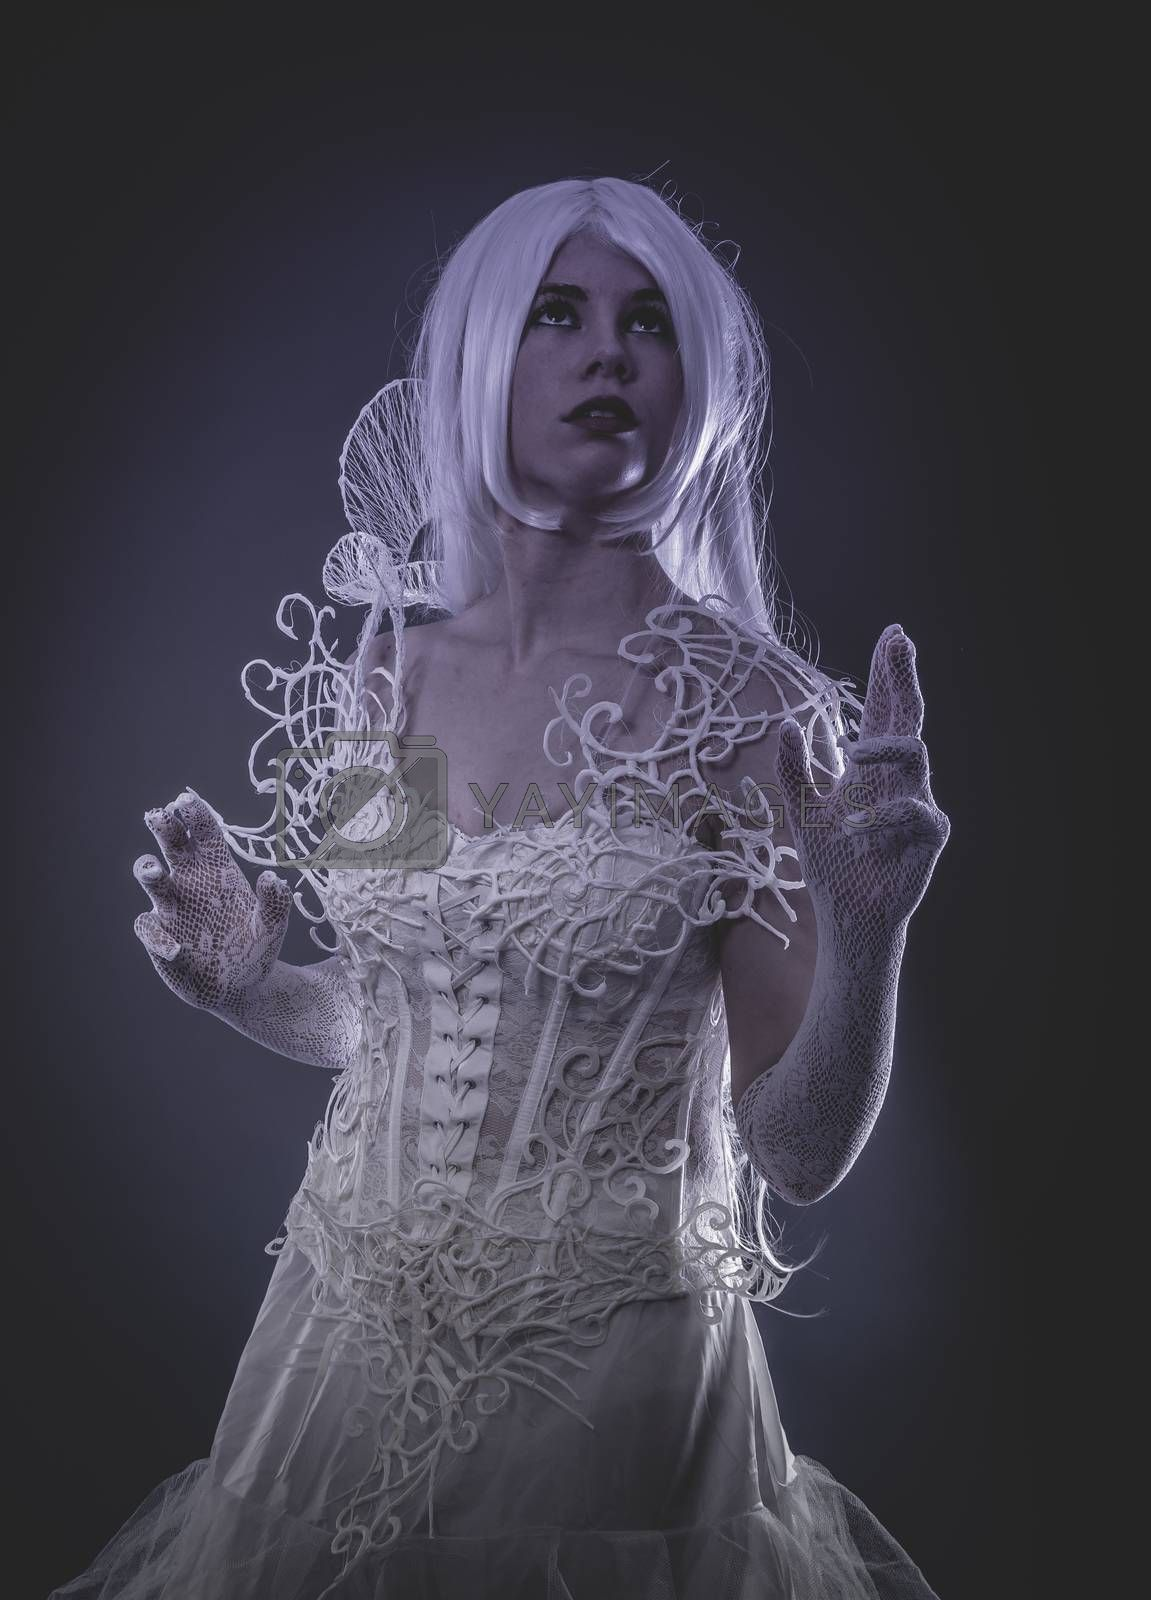 Sensual lady in white corset, long hair, handmade dress